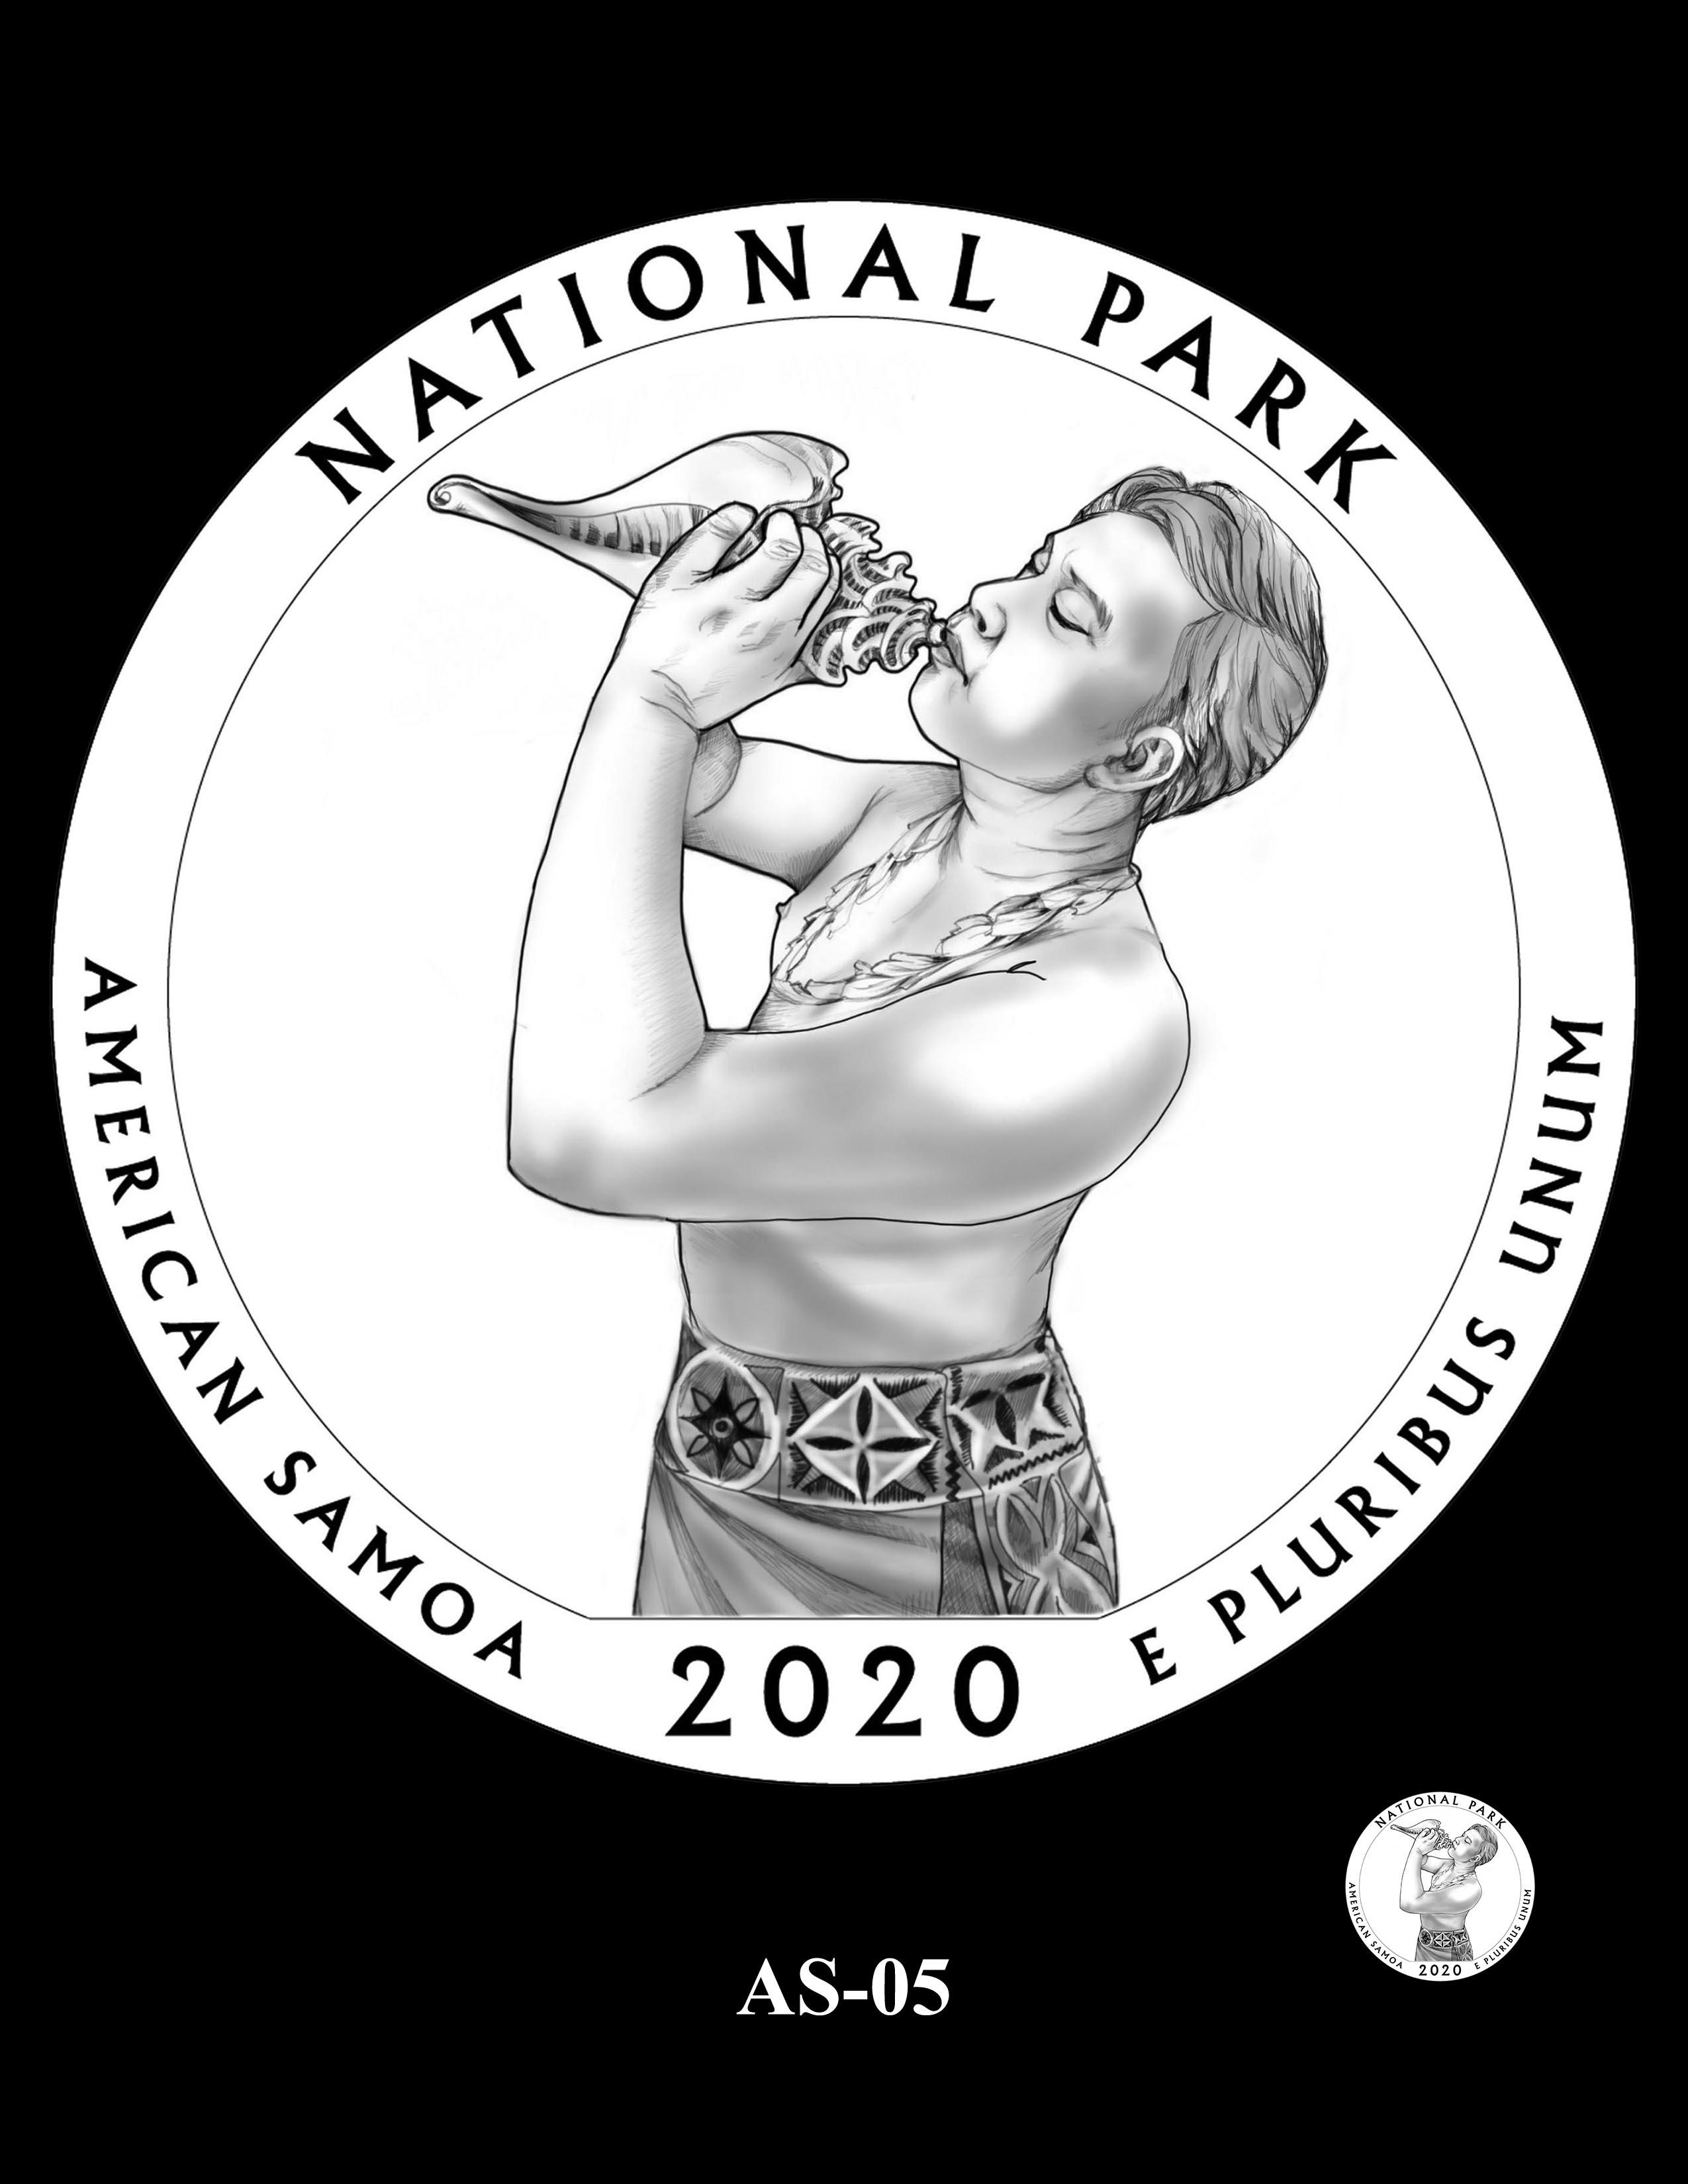 AS-05 -- 2020 America the Beautiful Quarters® Program